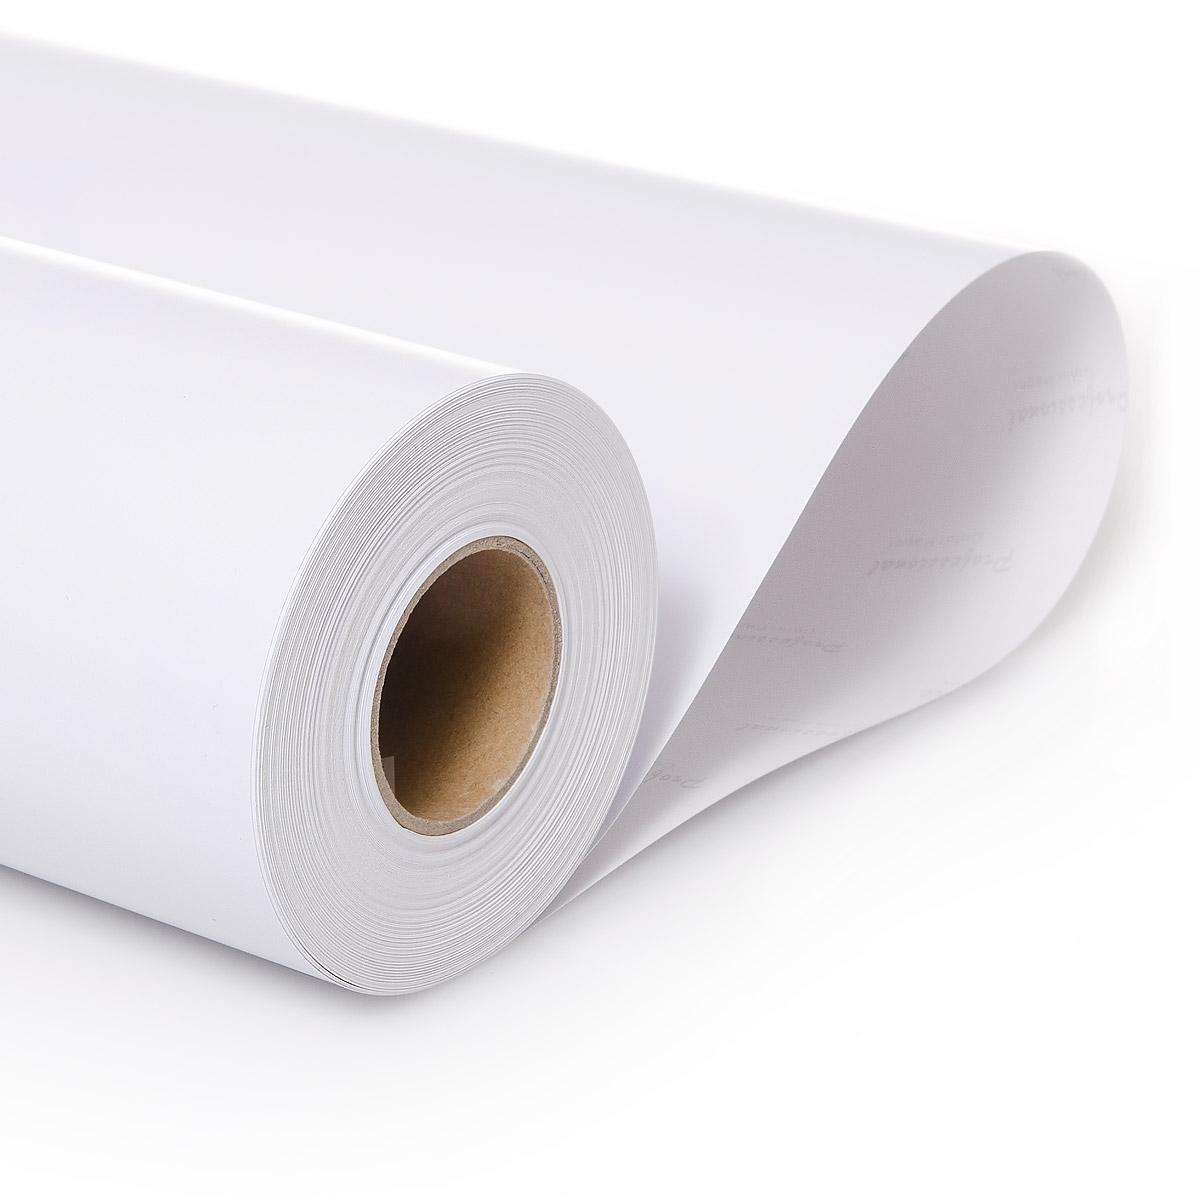 1 Rolle Inkjet RC Fotopapier | PREMIUM | Pearl | 260P | 61 cm x 30 m